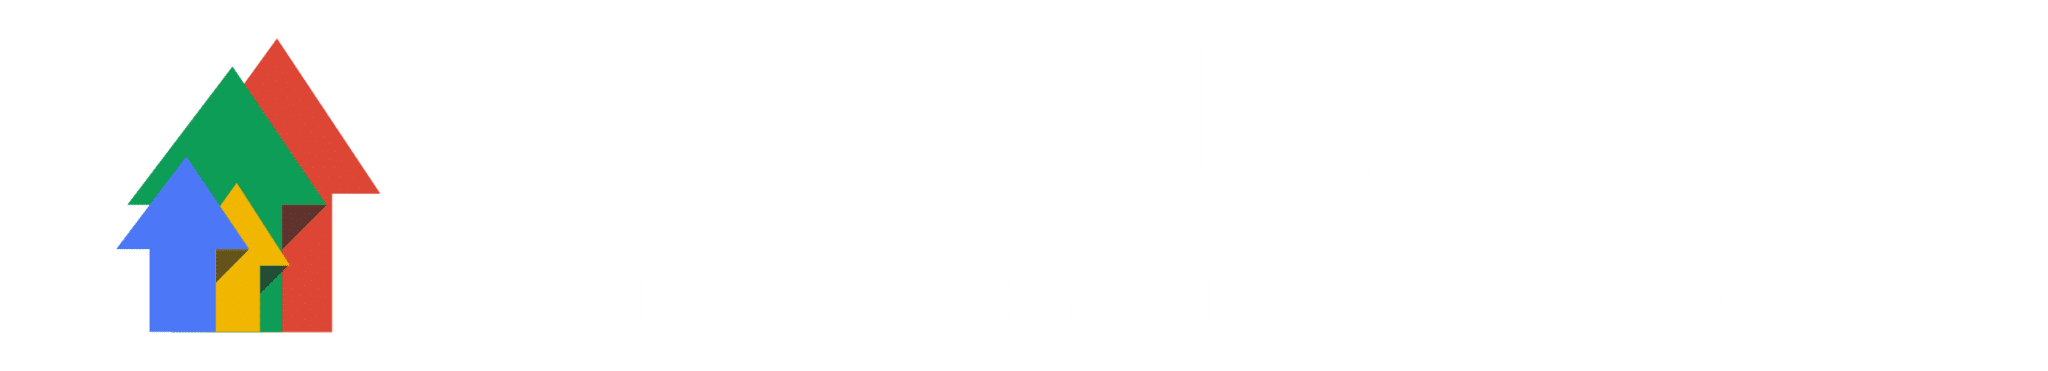 logo_seoreseller2ret